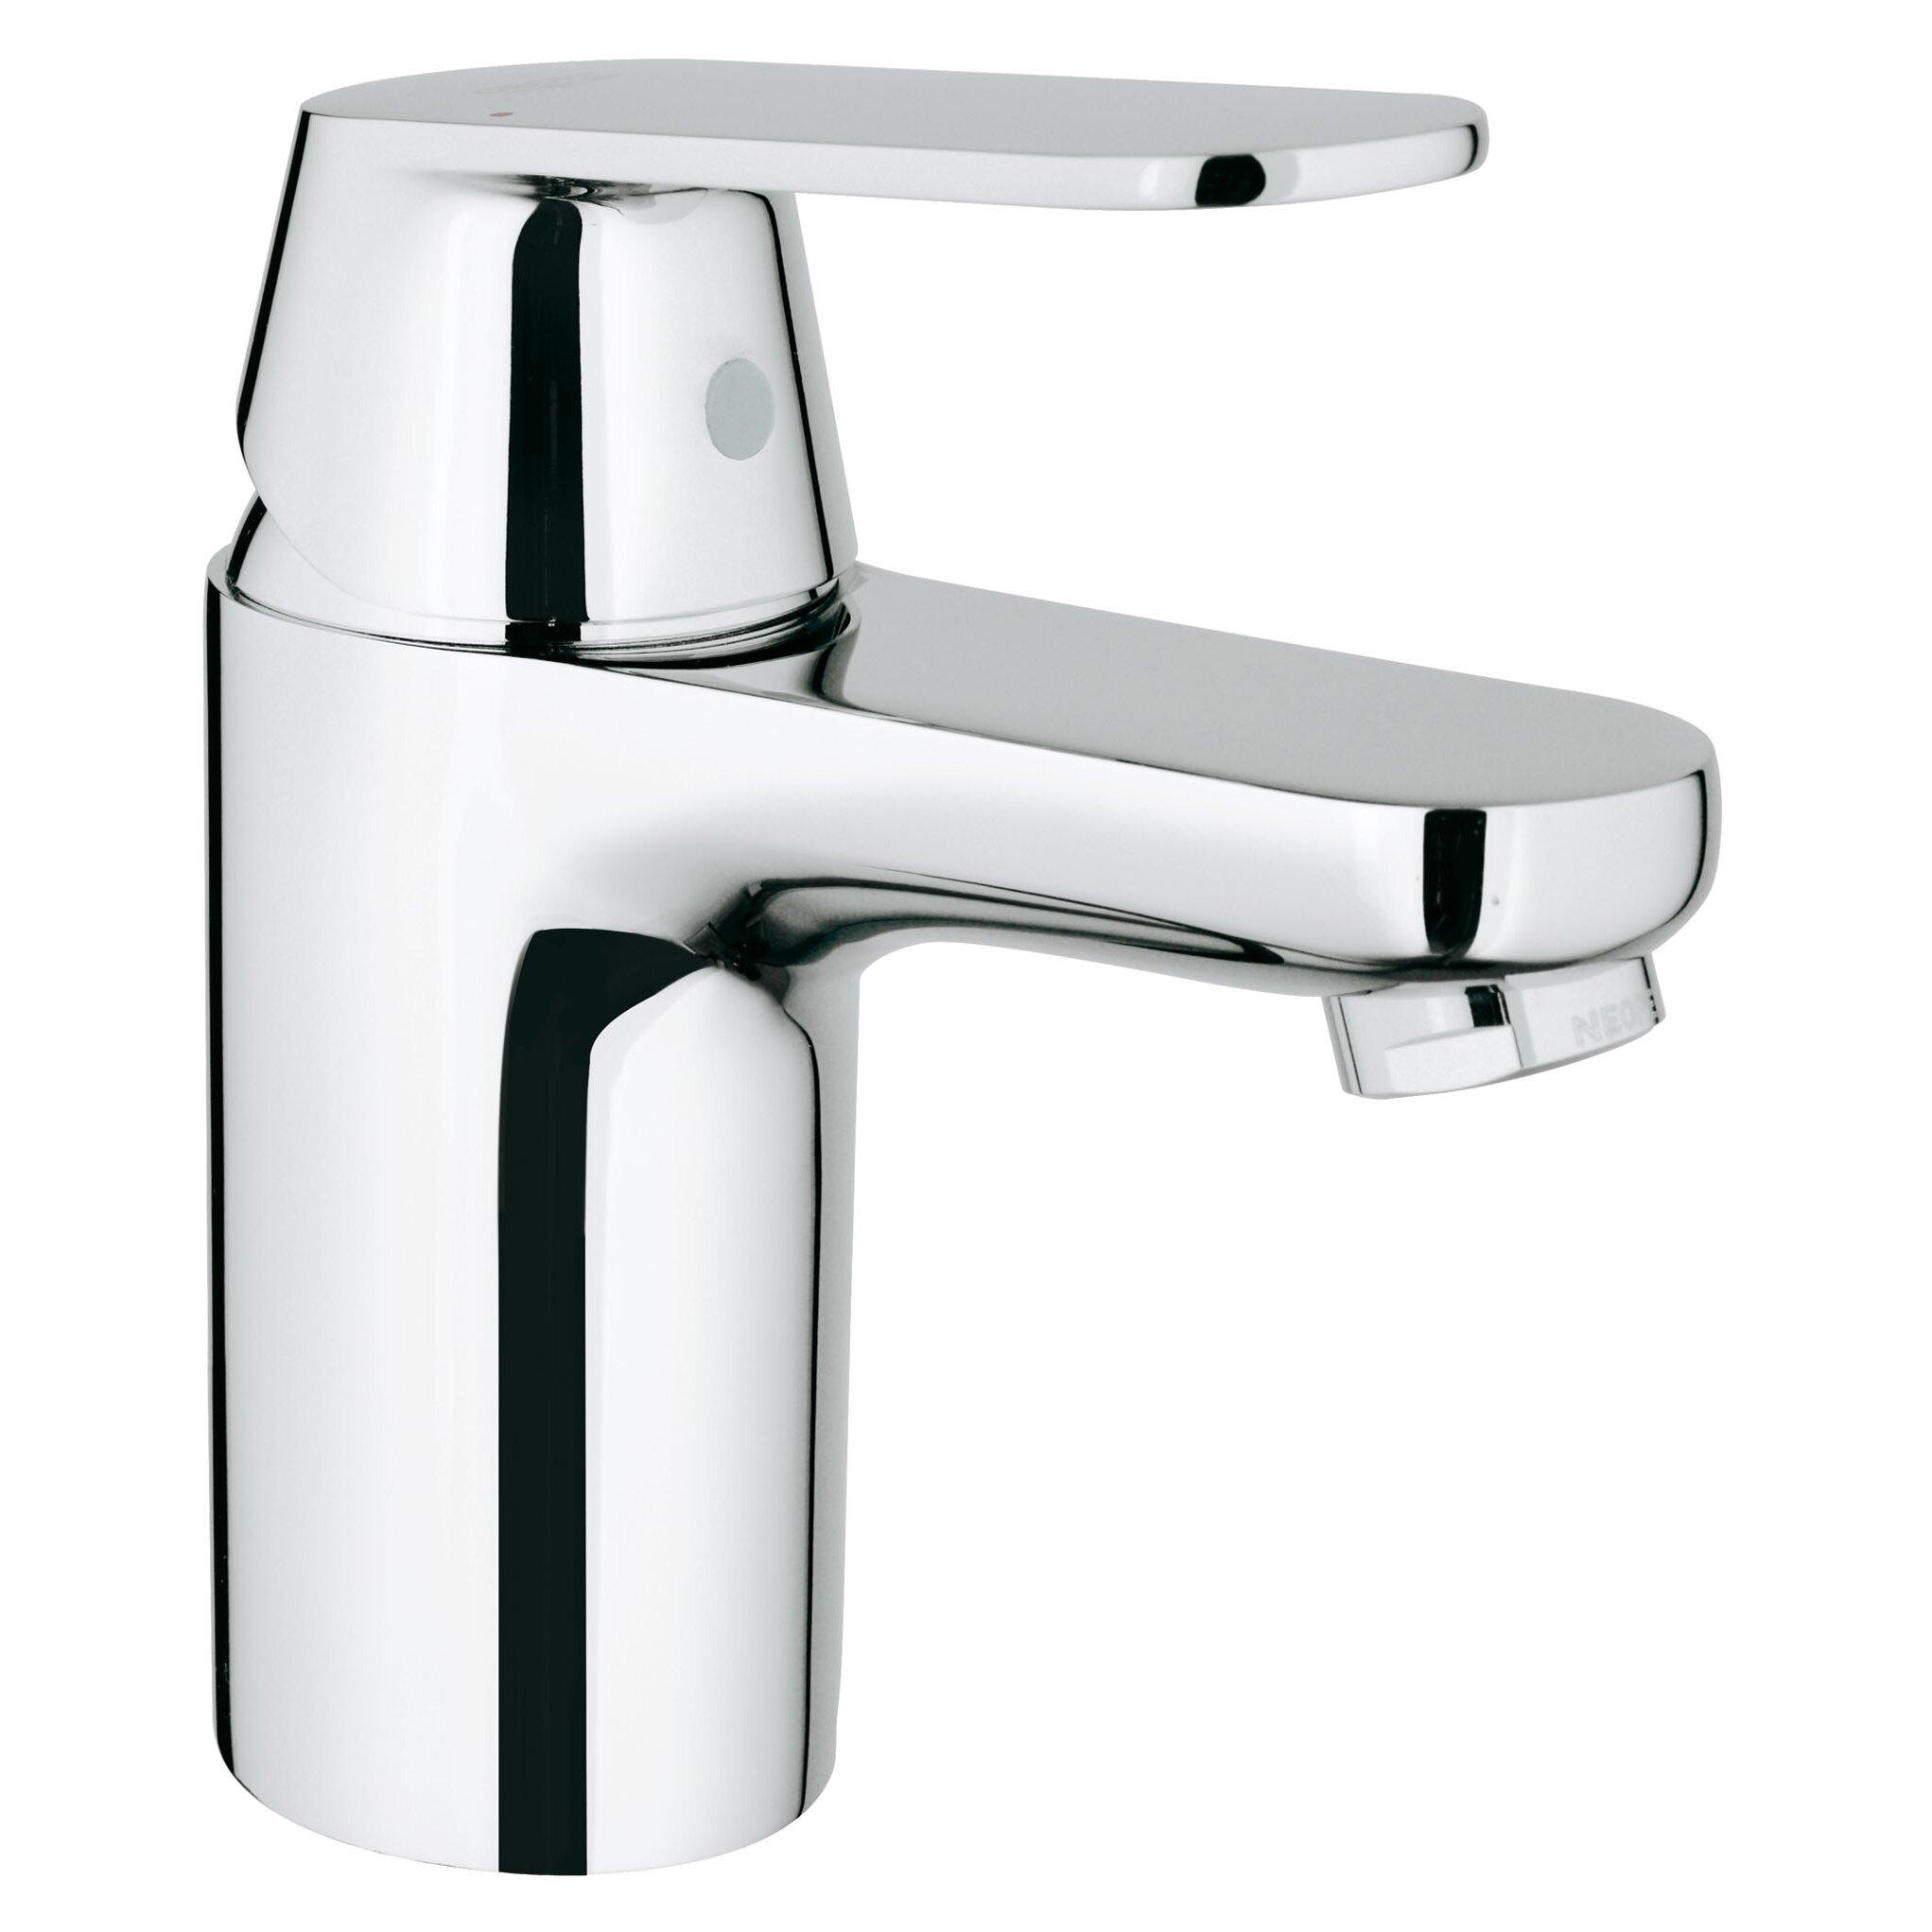 grohe eurocube bathroom faucet | My Web Value